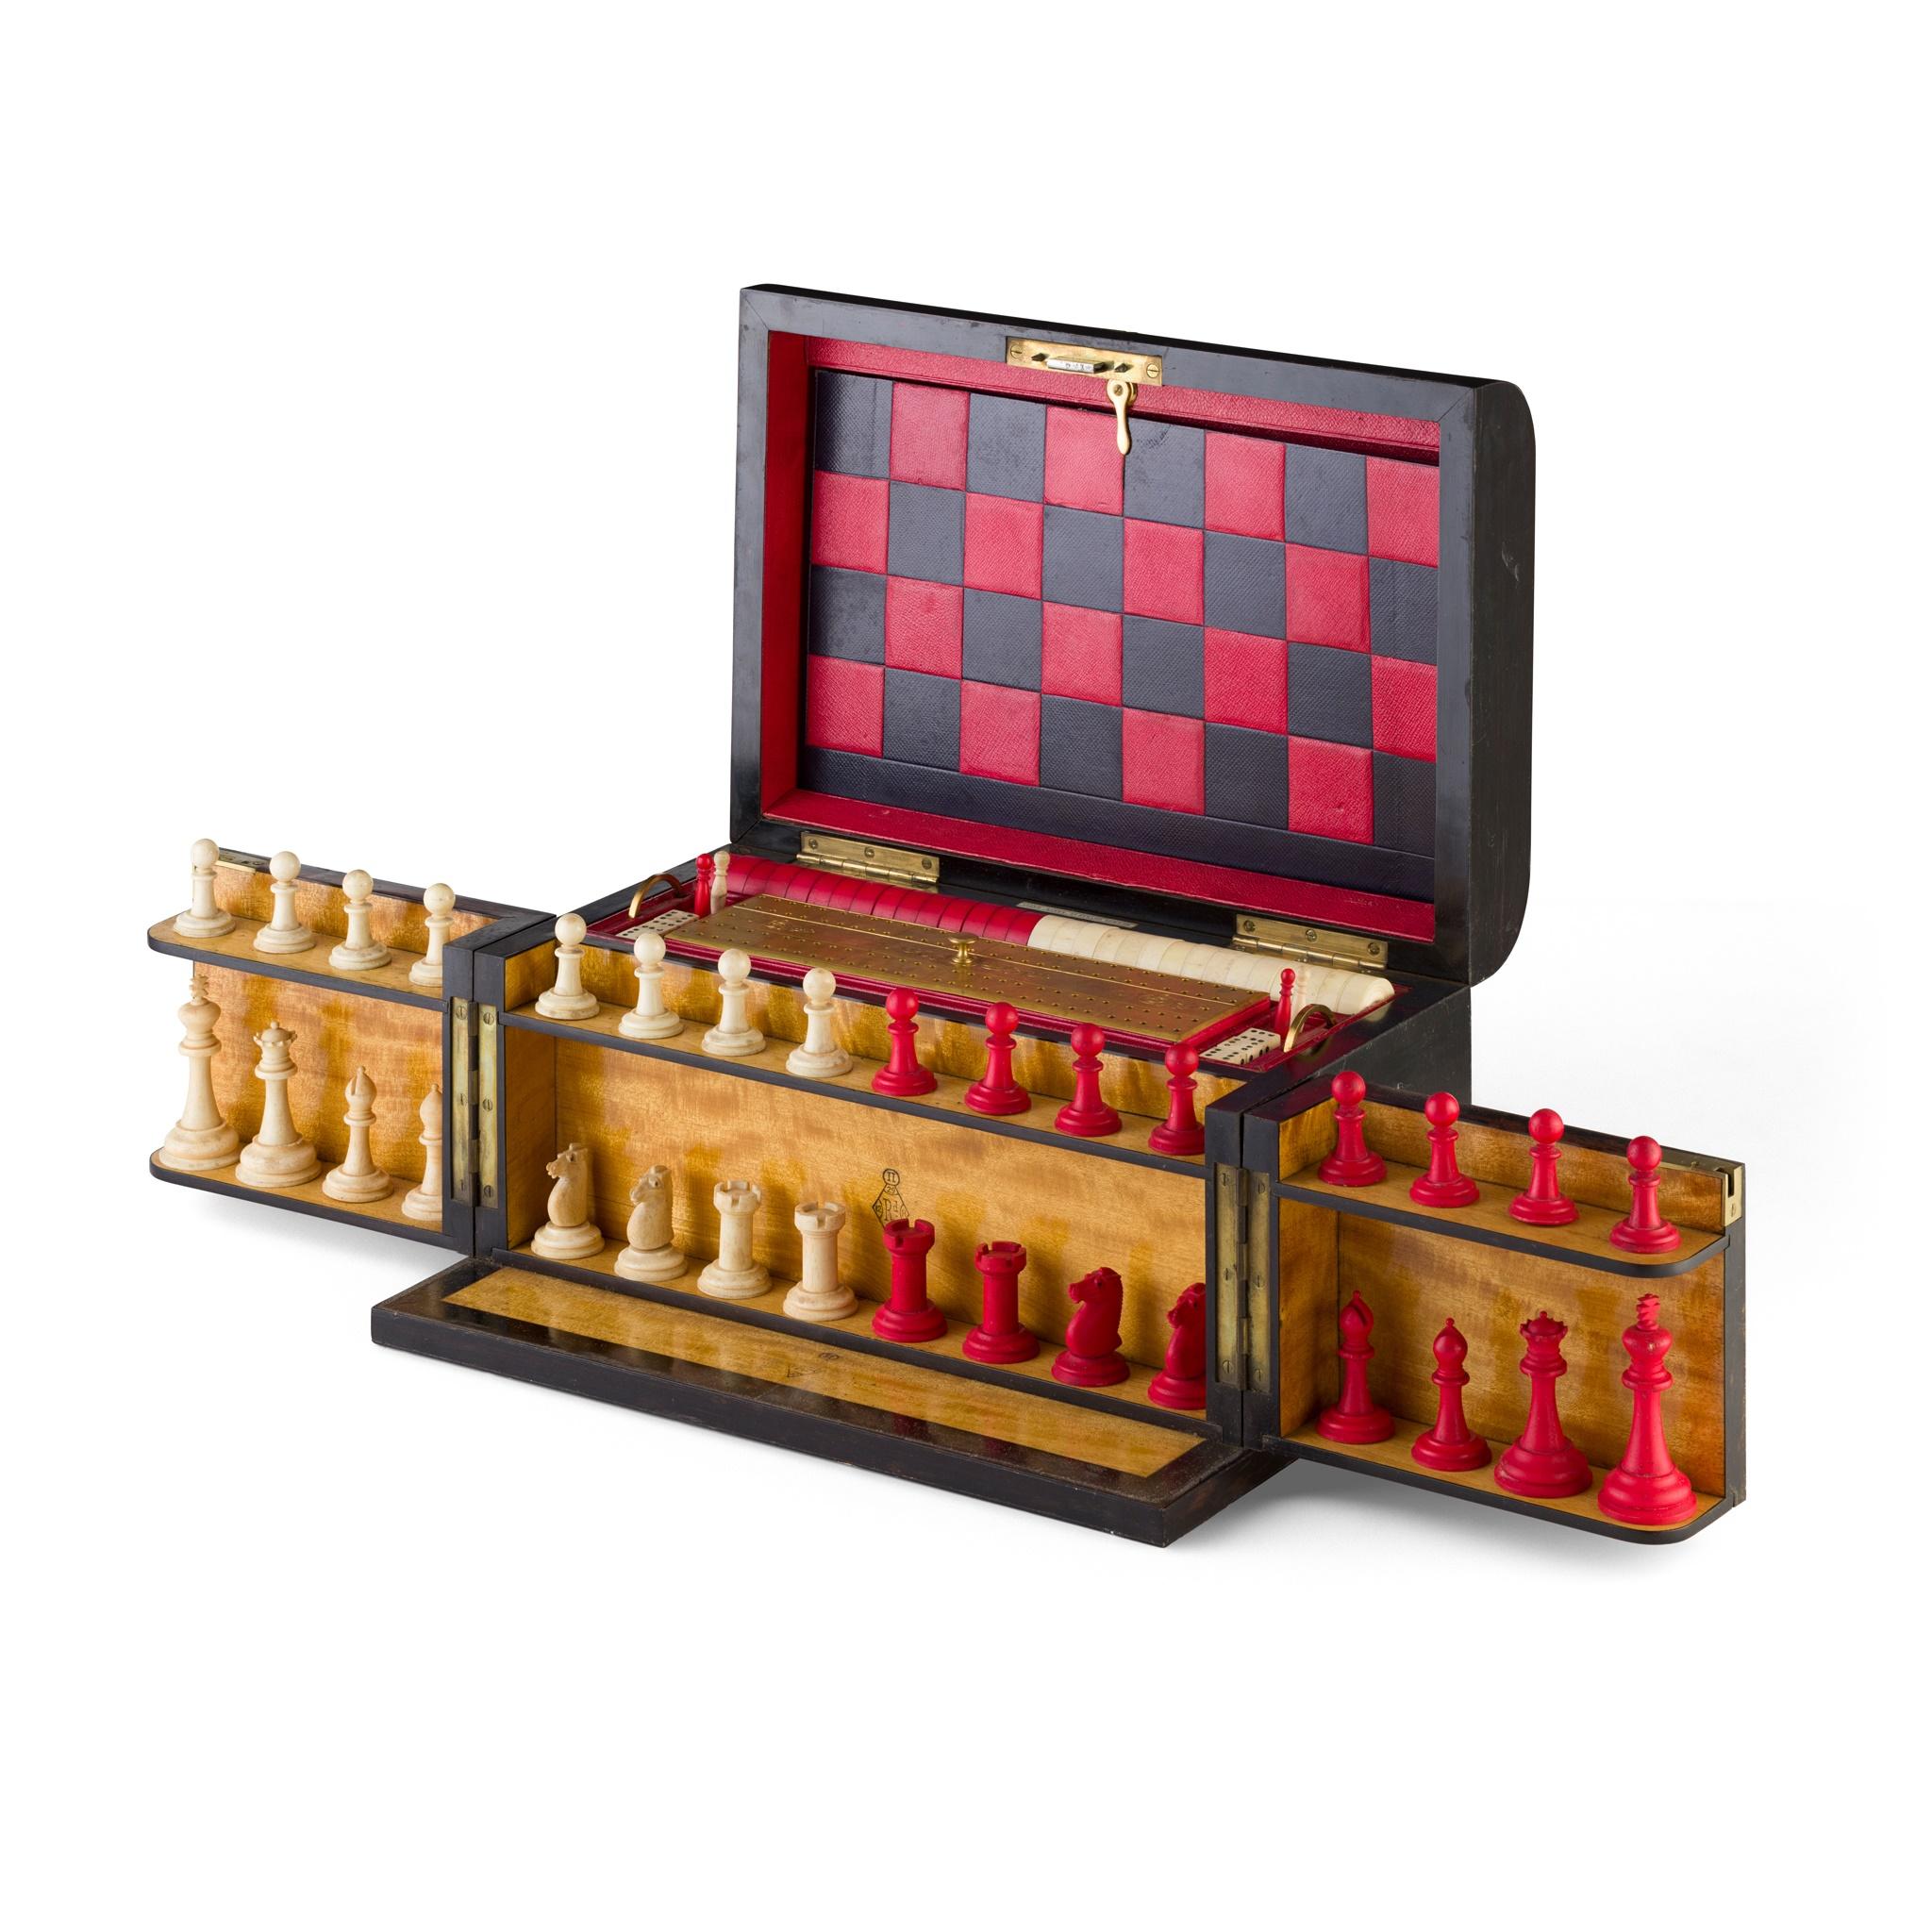 Y VICTORIAN COROMANDEL GAMES COMPENDIUM DATED 1869, BY ALLEN, 37 STRAND, LONDON